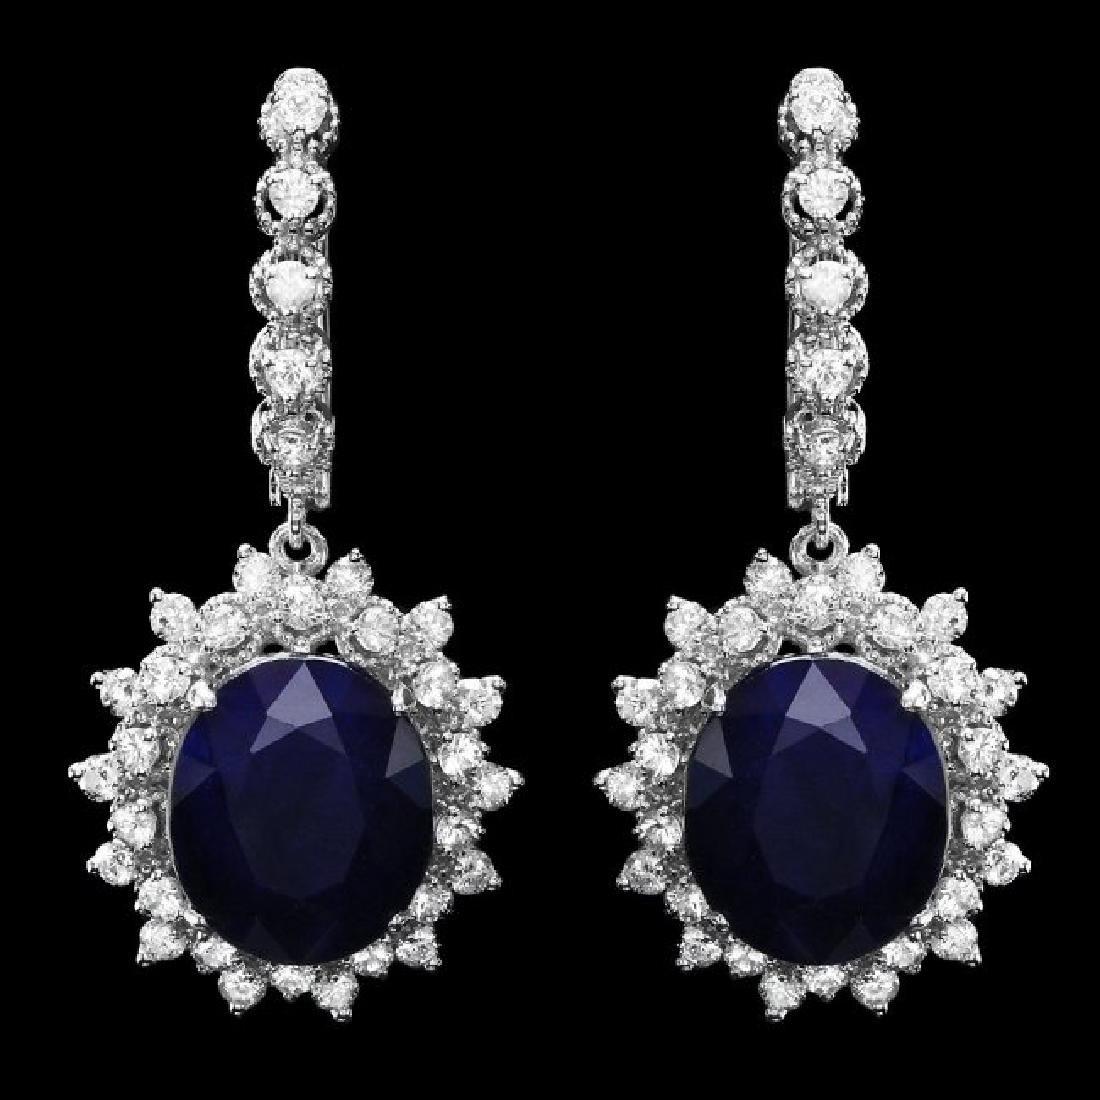 14k Gold 15.00ct Sapphire 2.00ct Diamond Earrings